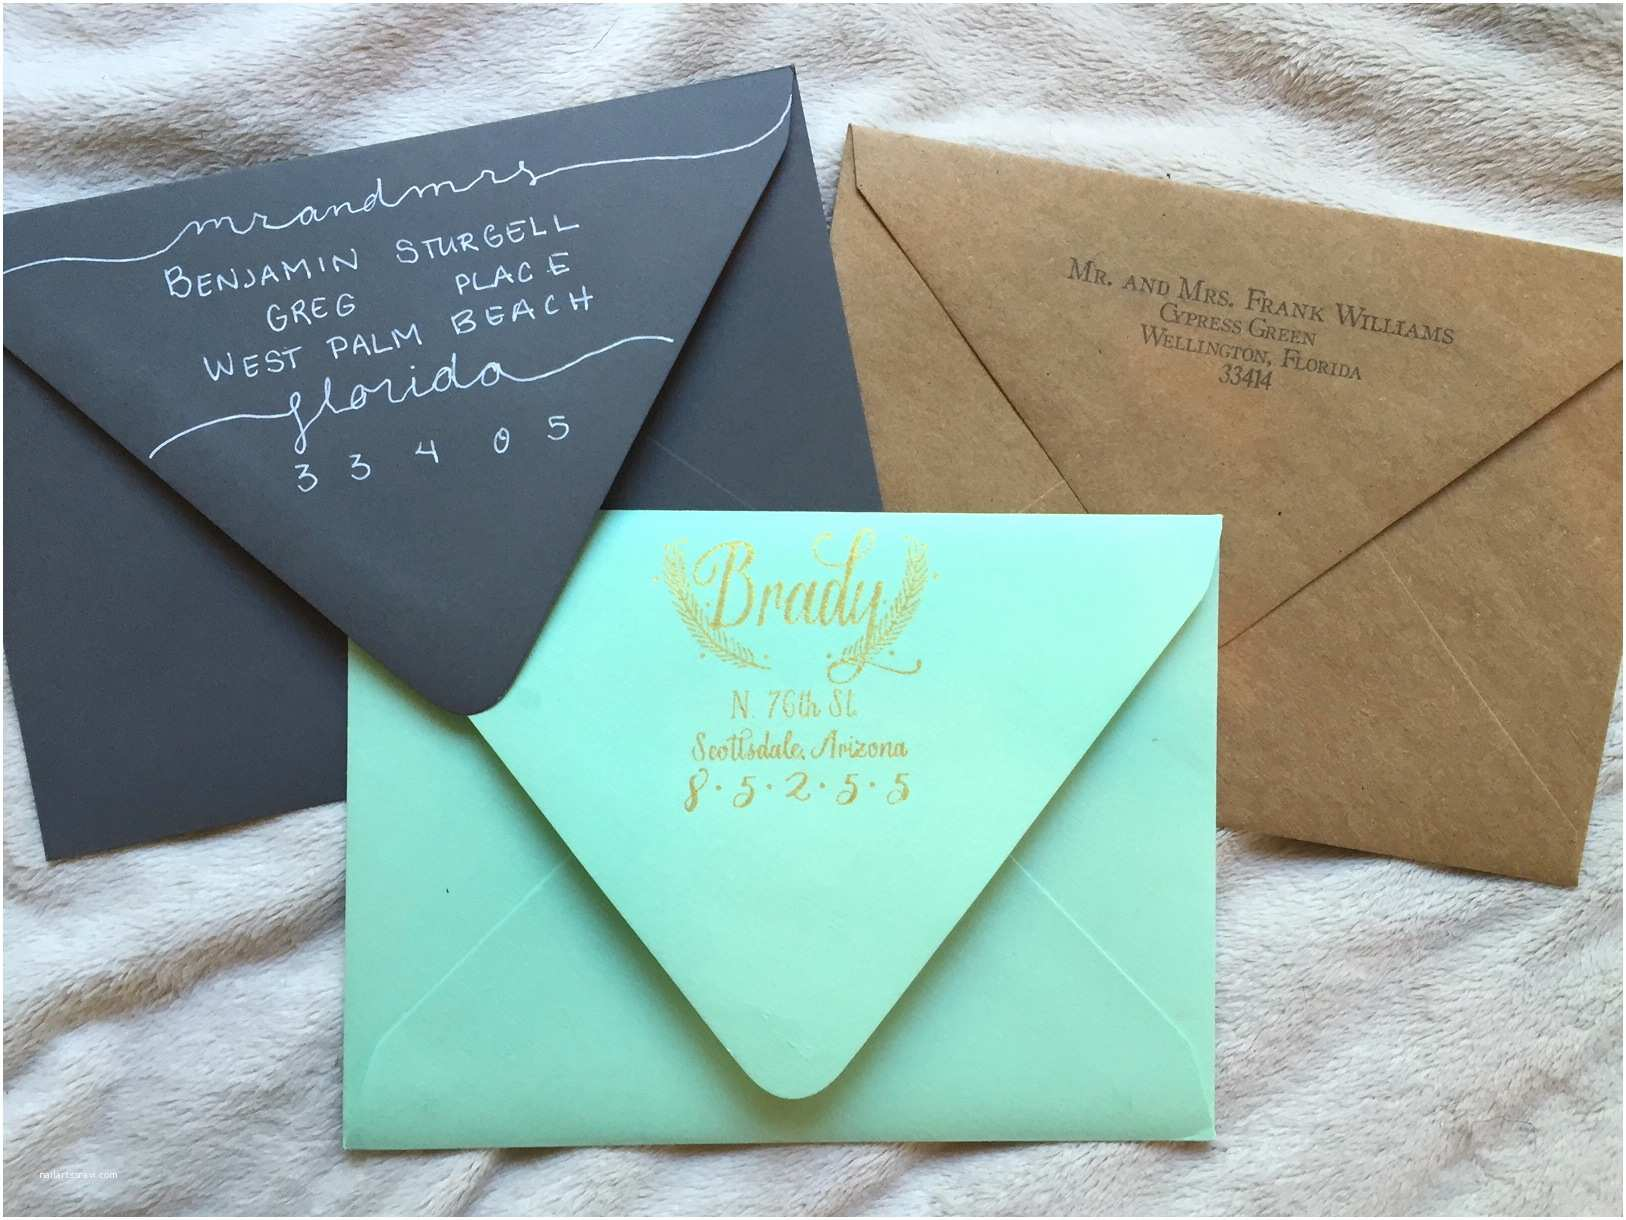 Proper Wedding Invitation Addressing Etiquette Rules Addressing Envelopes